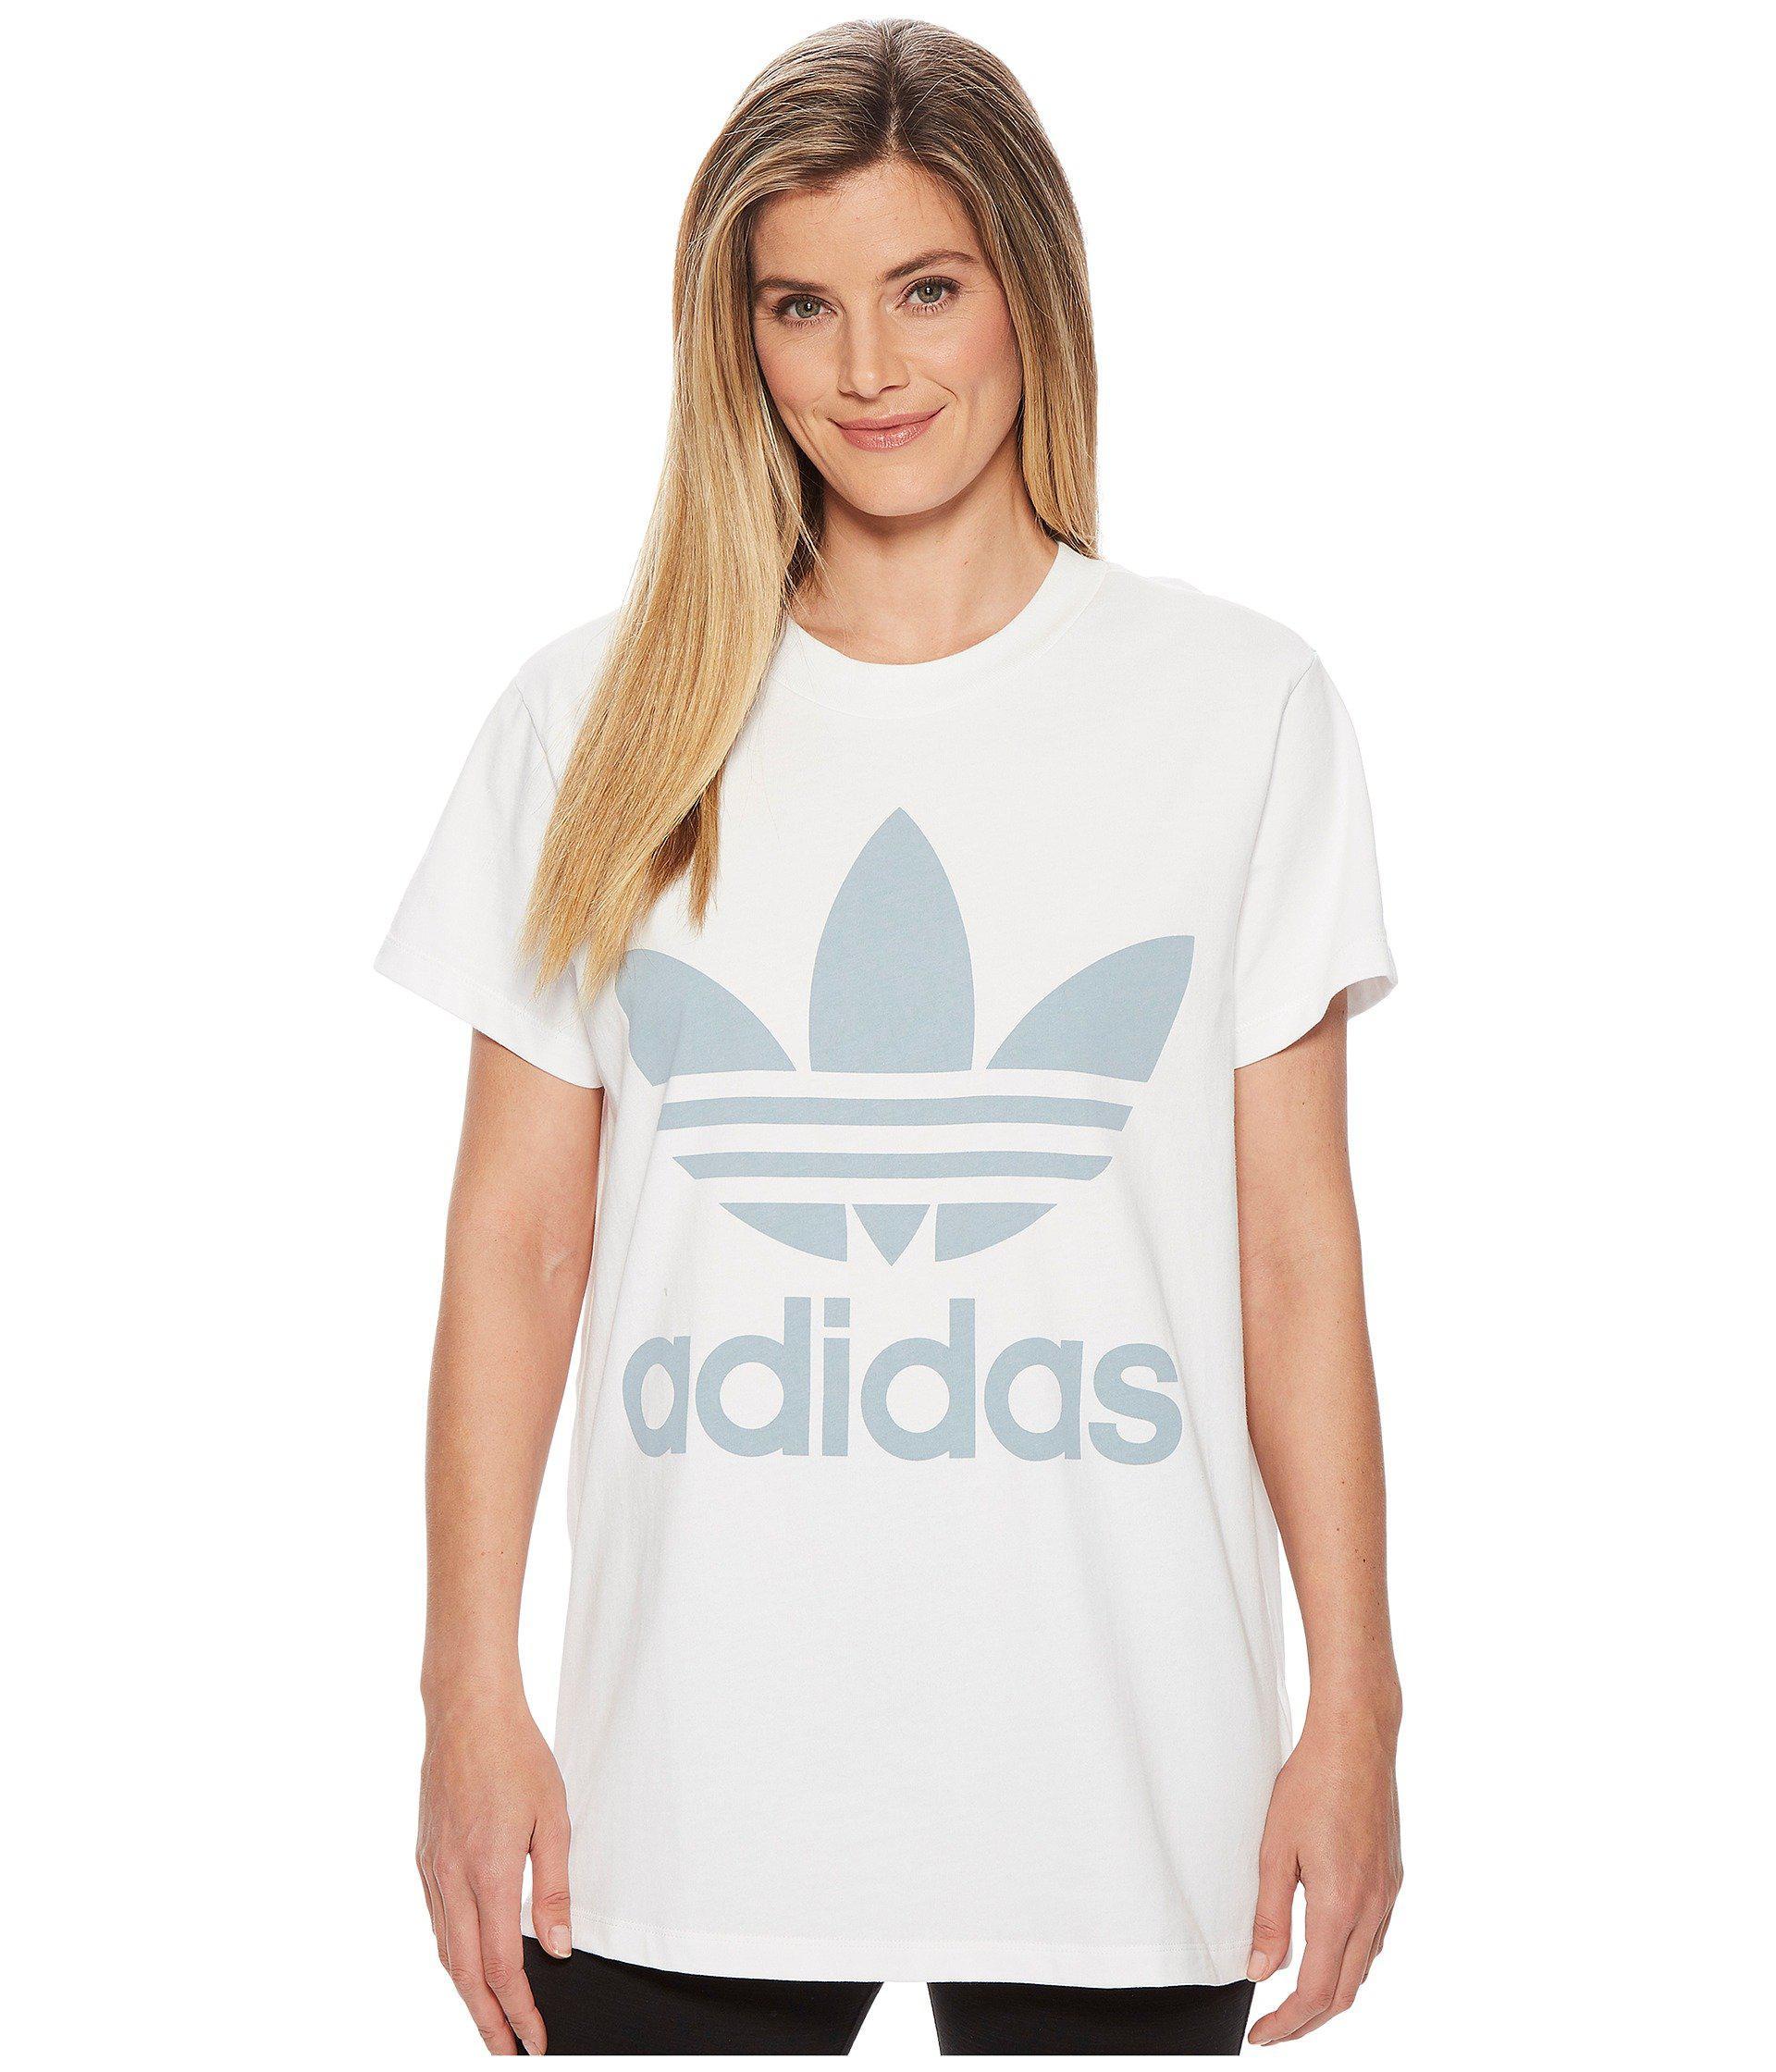 511058b59b6 adidas Originals Big Trefoil Tee in White - Lyst